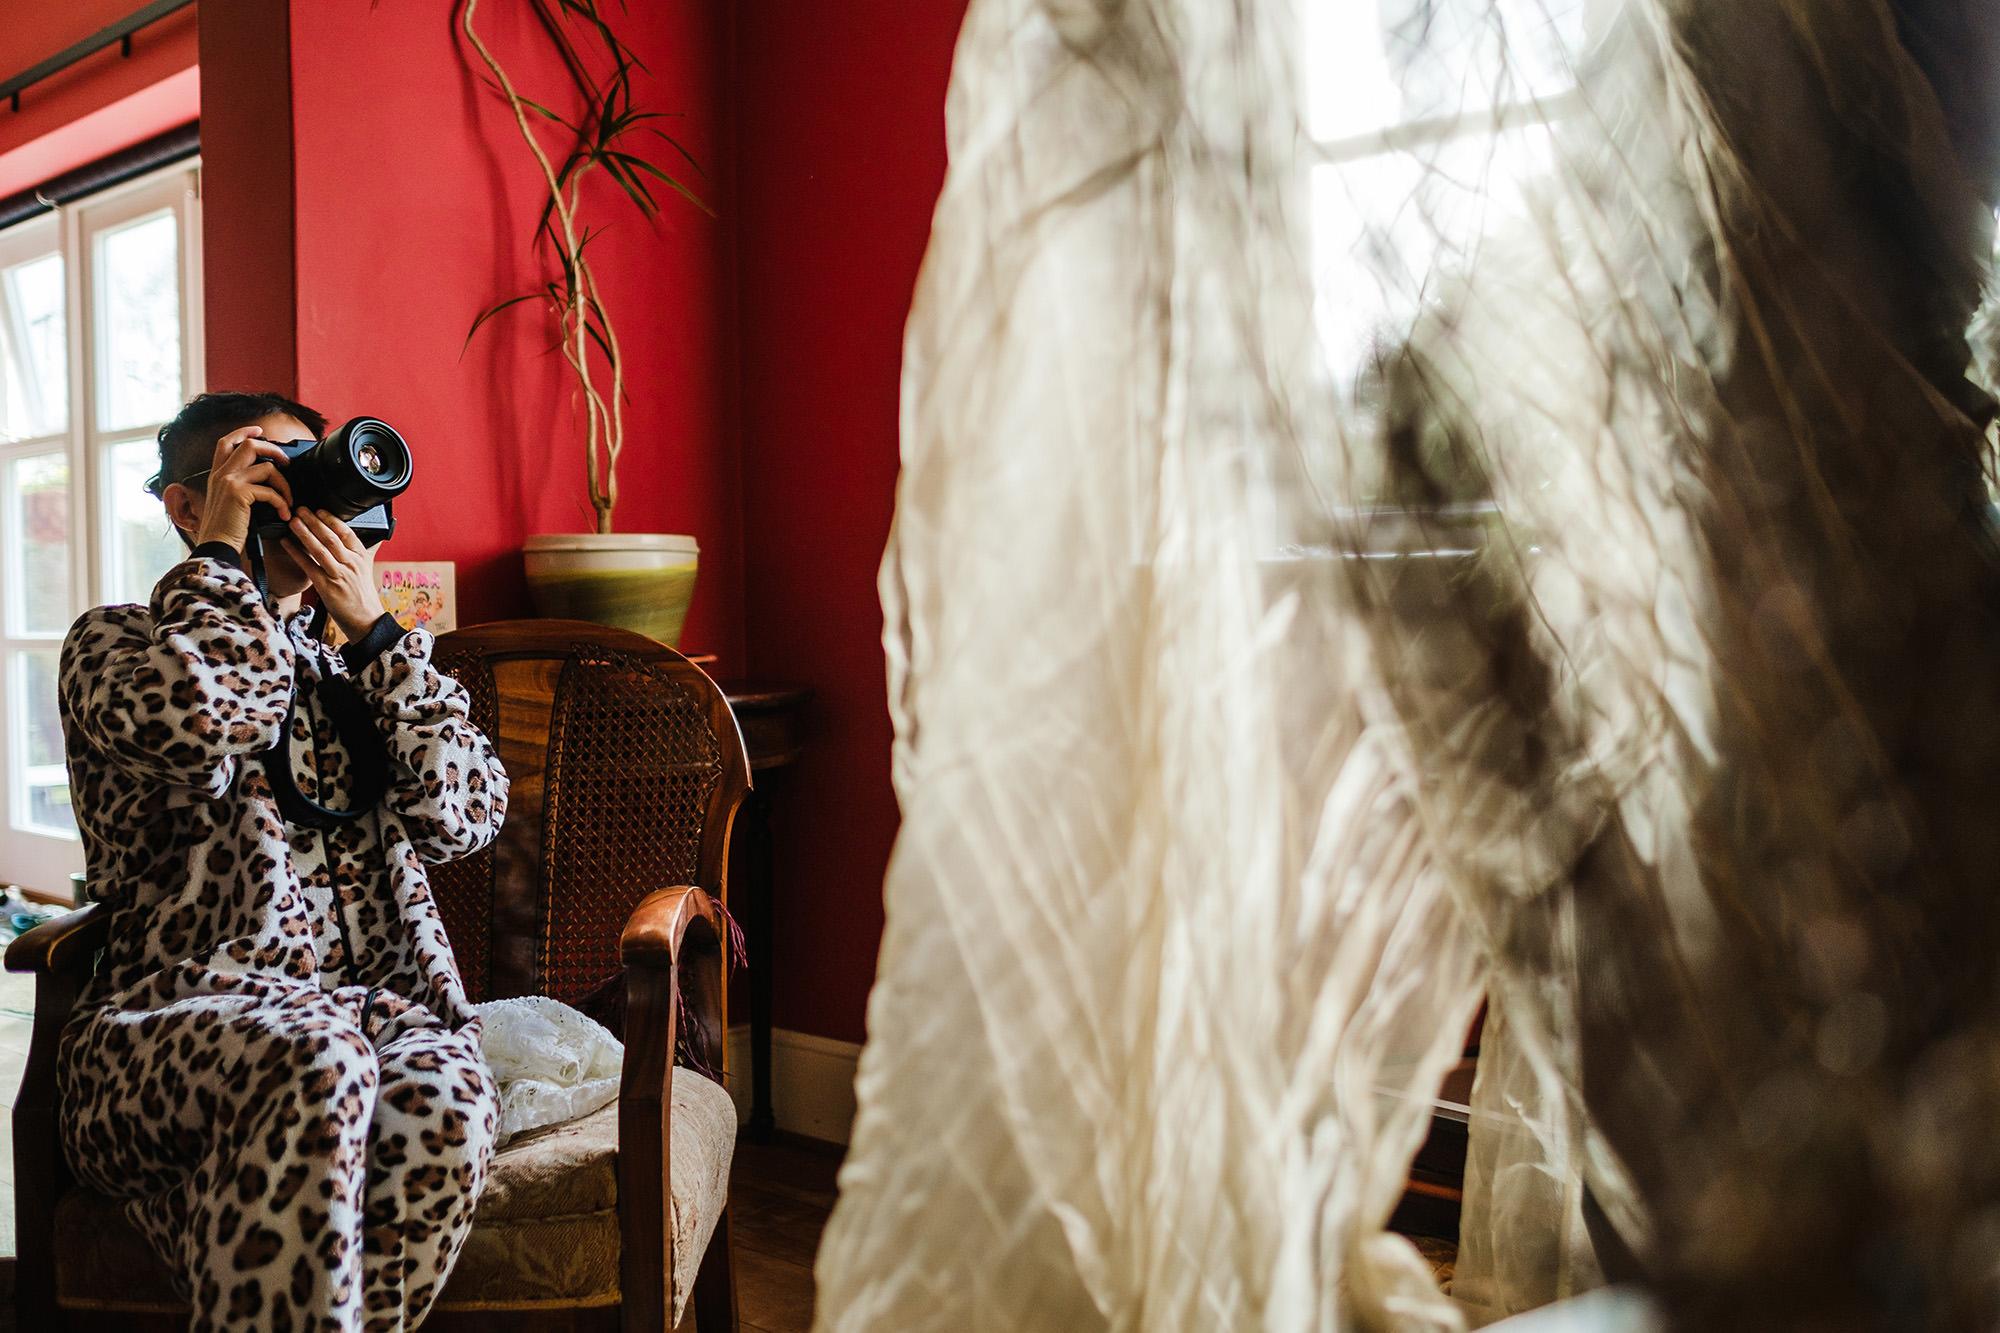 Marianne shooting creative conceptual portrait